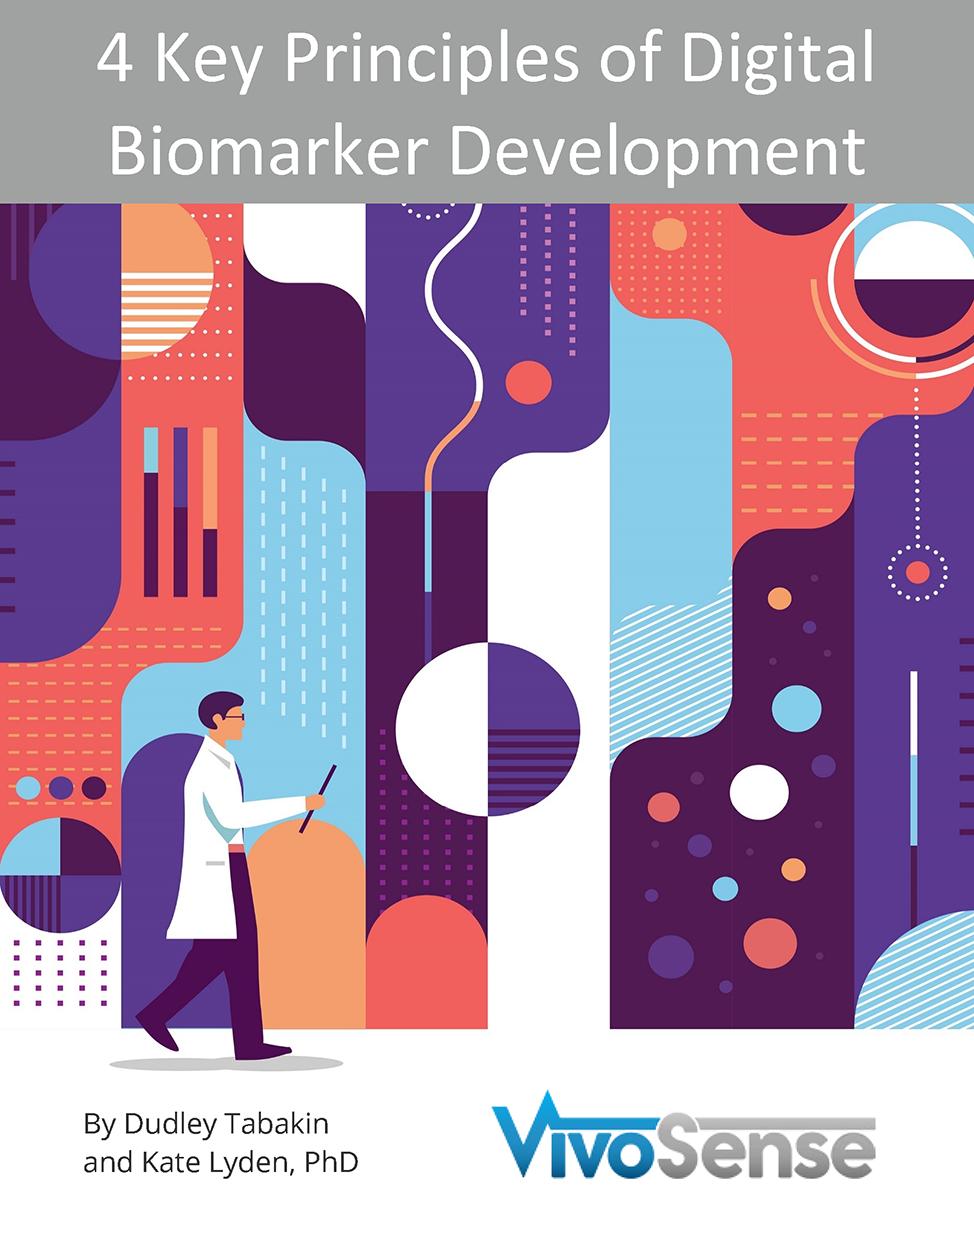 4 Key Principles of Digital Biomarker Development